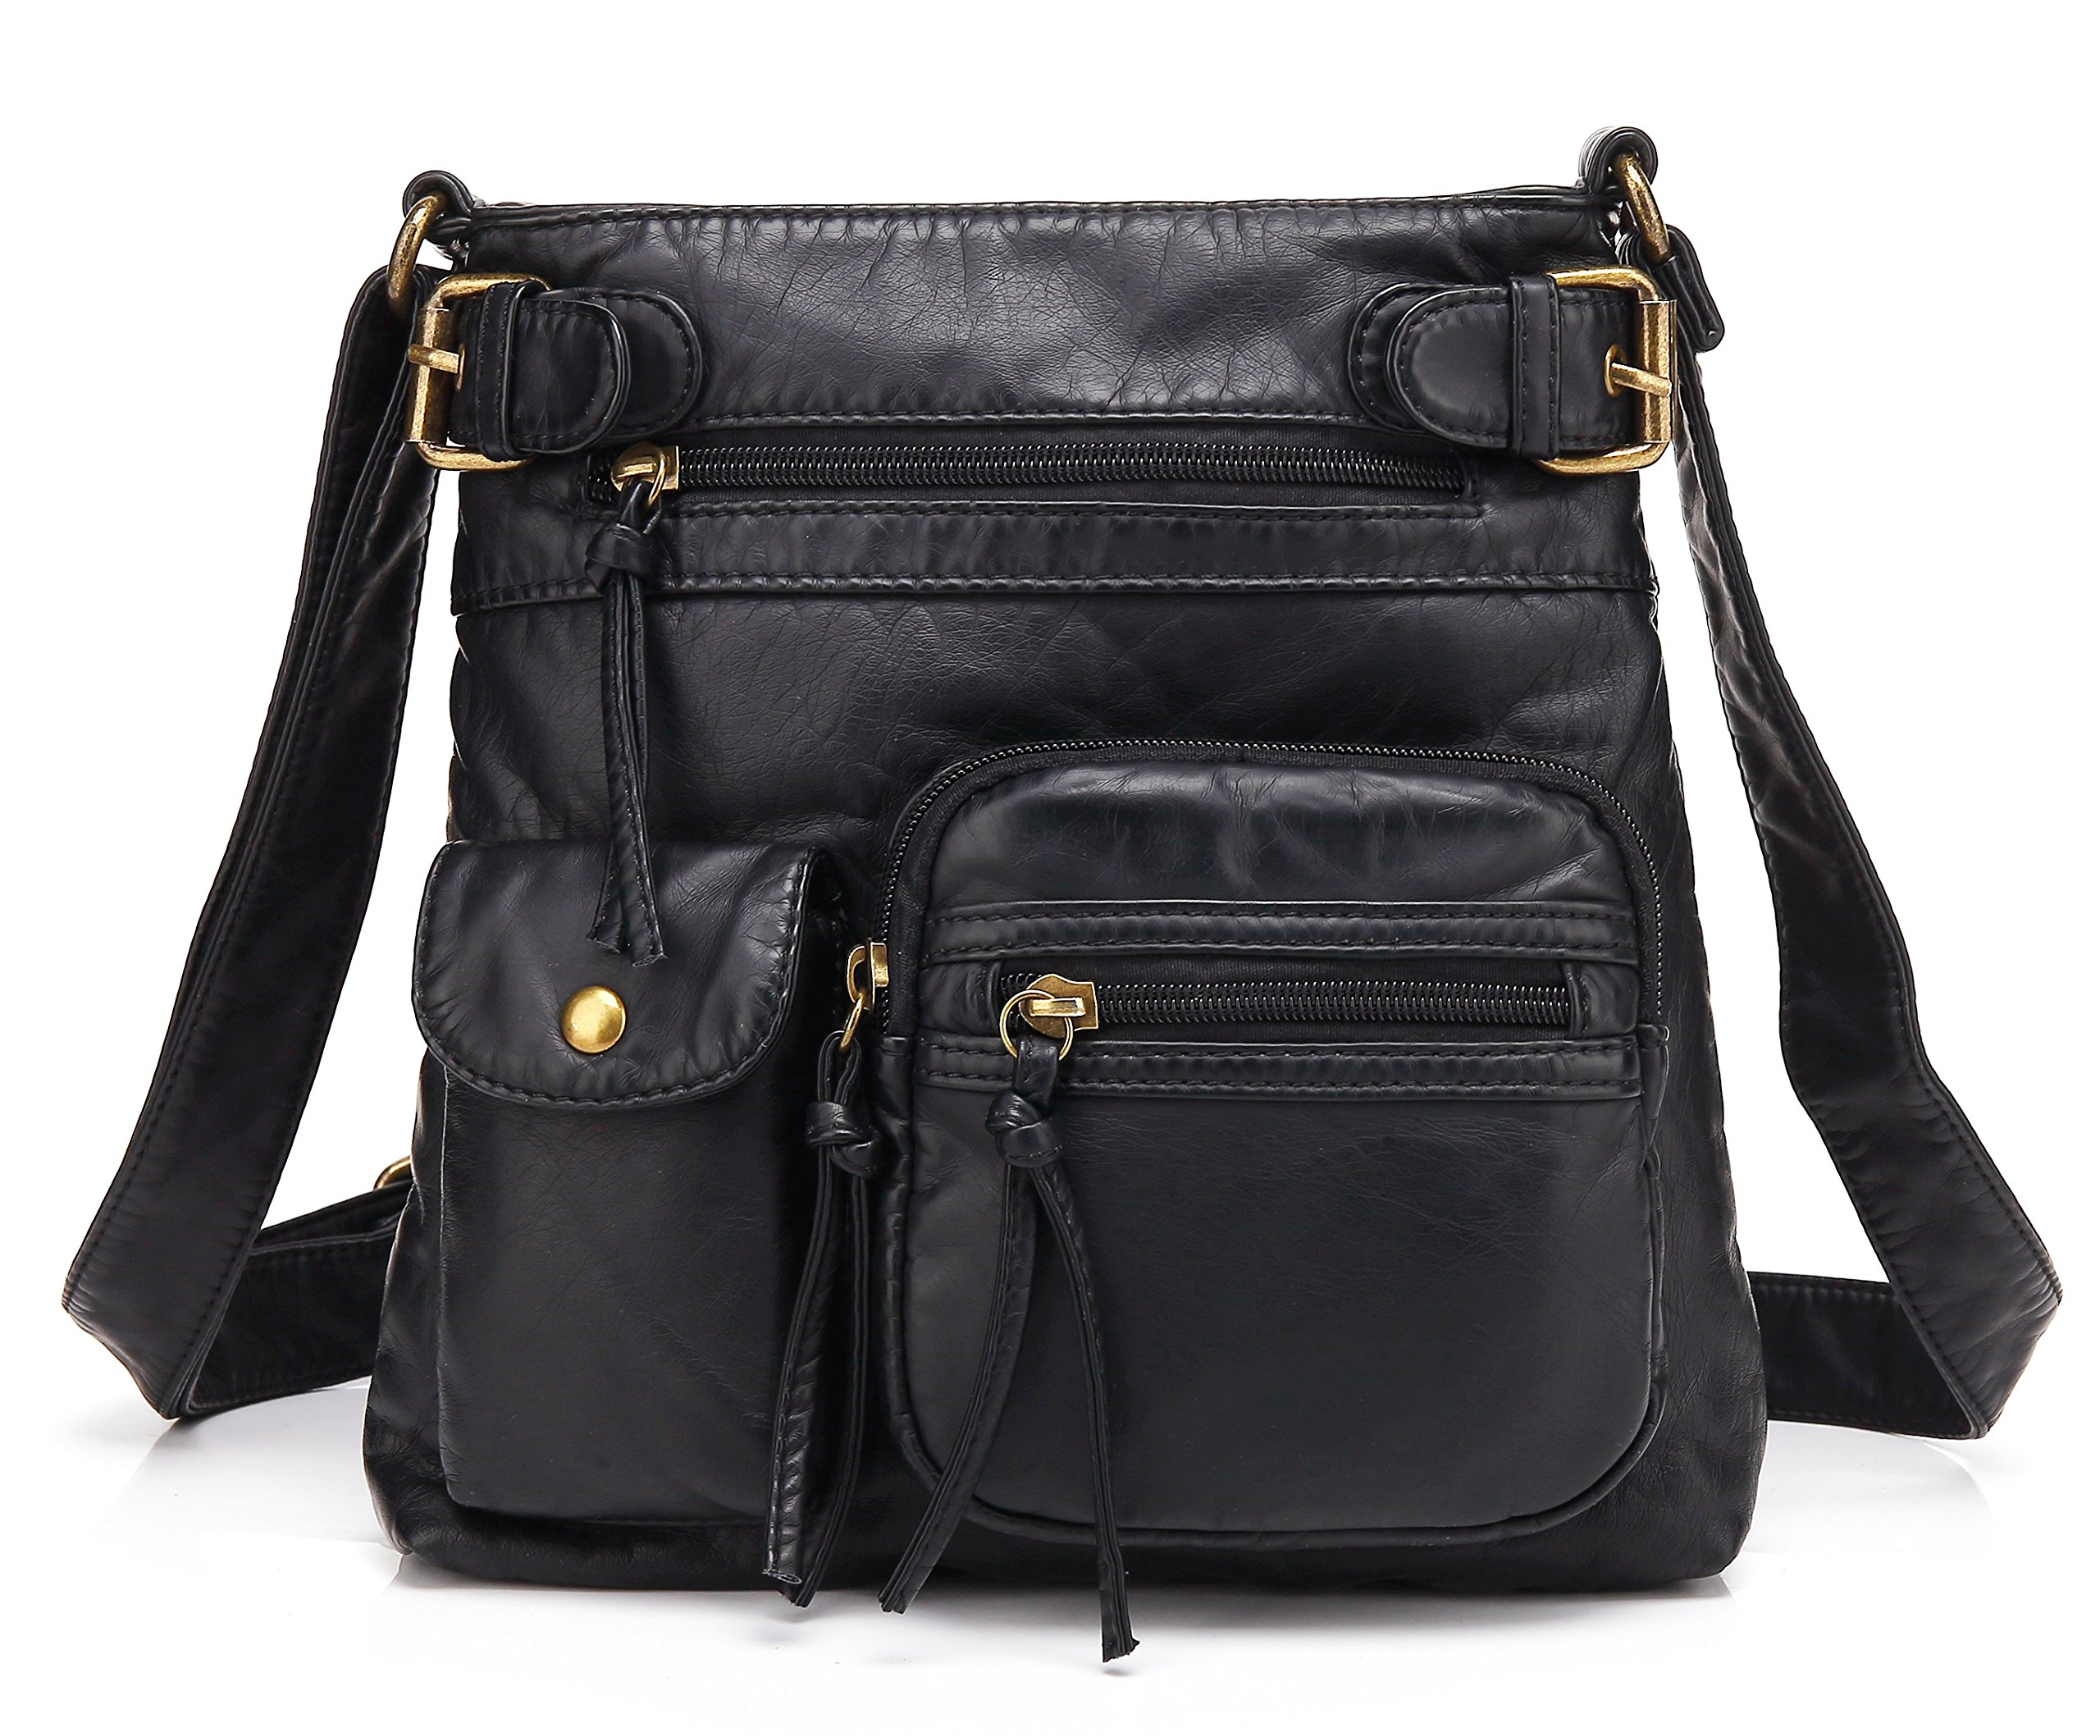 Scarleton Accent Top Belt Crossbody Bag H183301 - Black